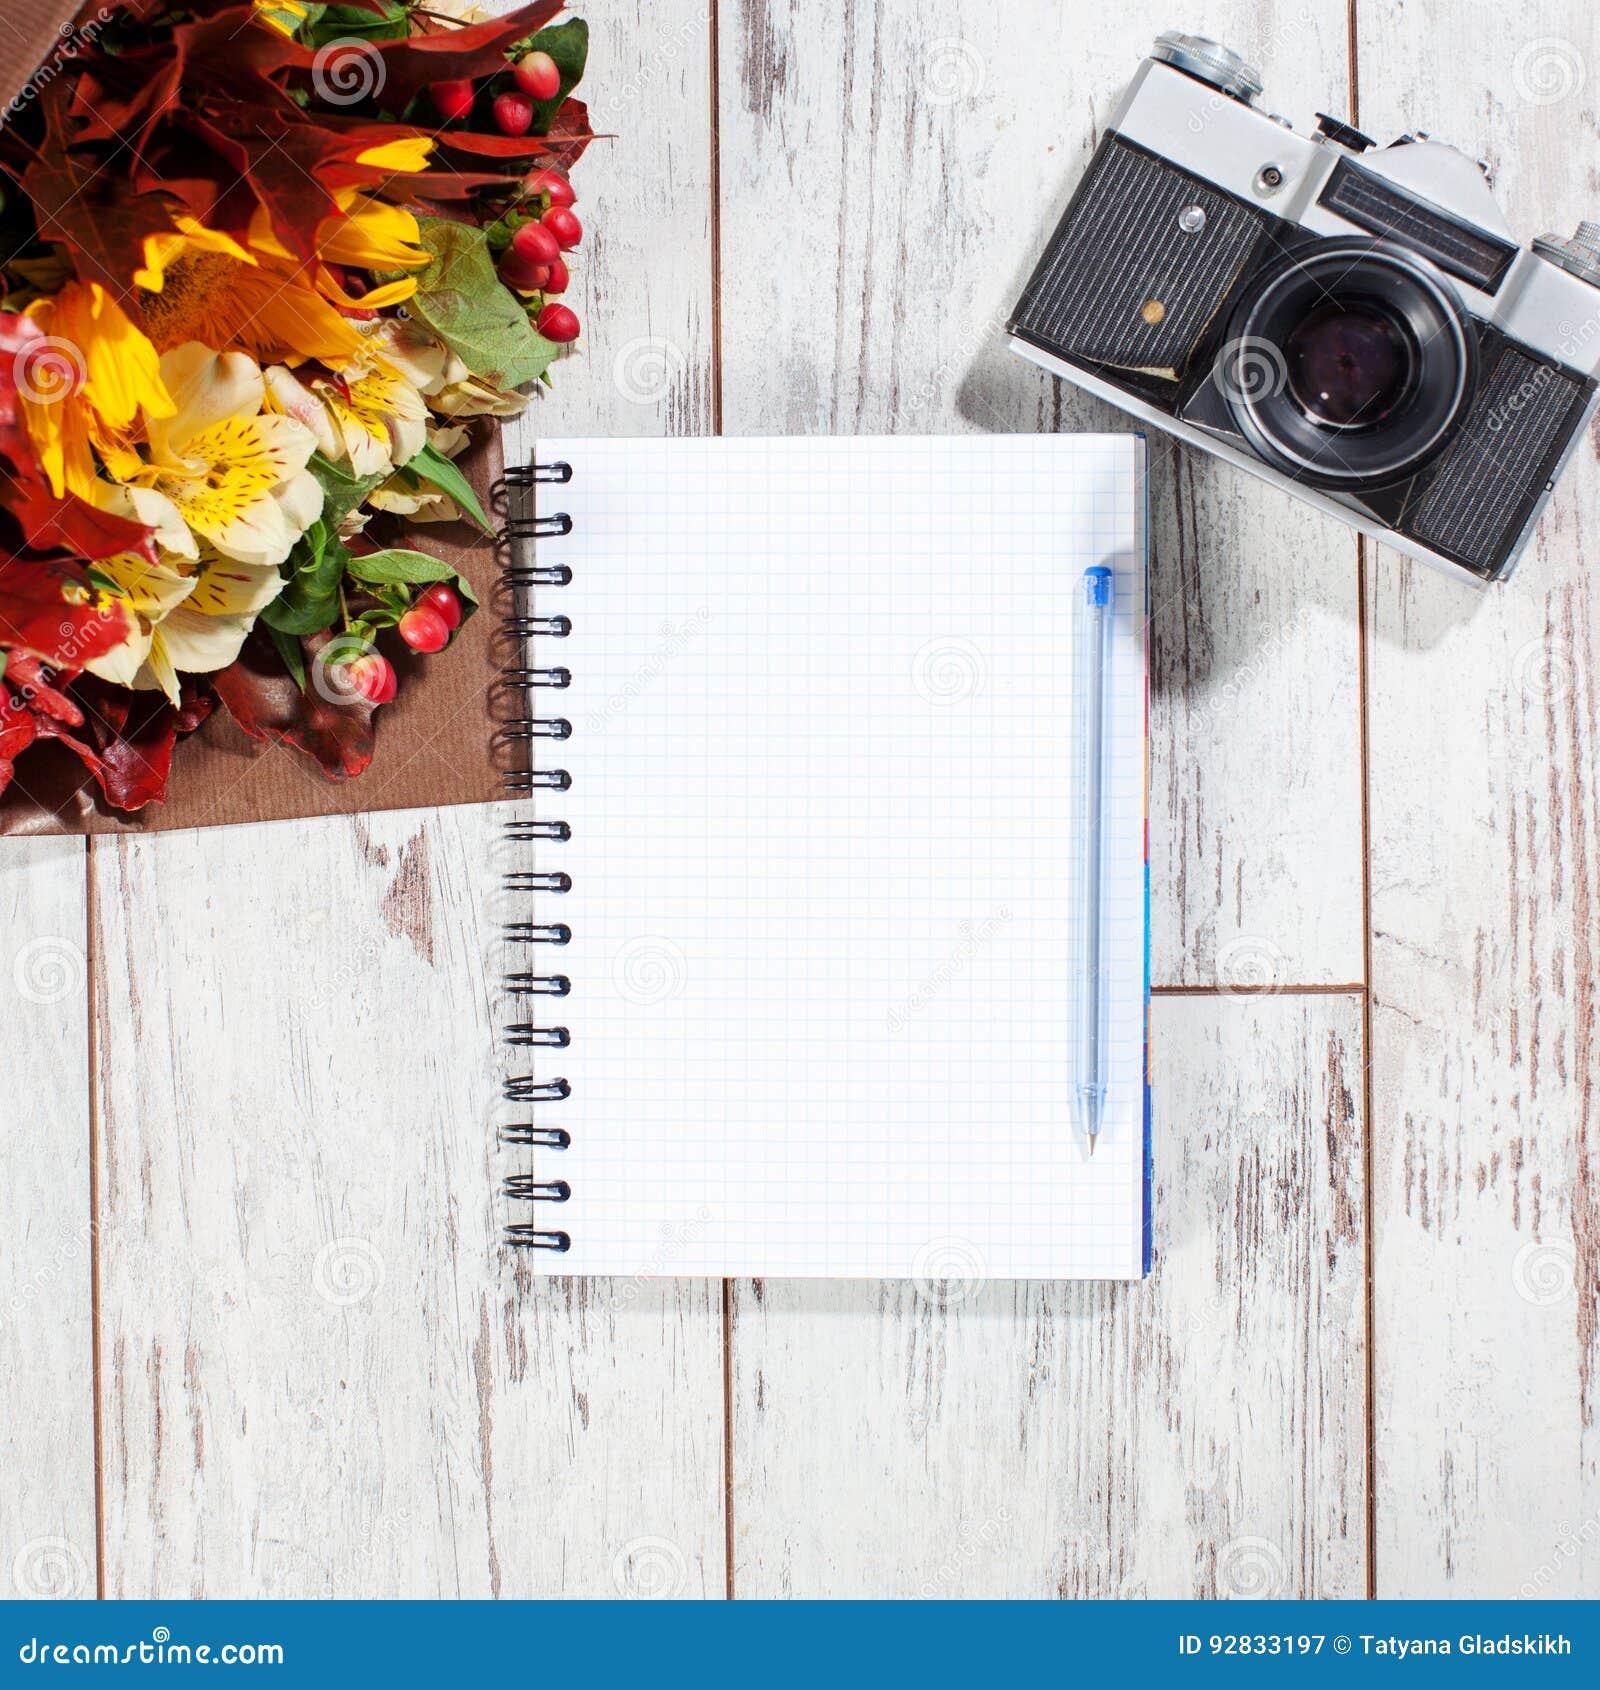 kamera mit stift f r die planung stockfoto bild 92833197. Black Bedroom Furniture Sets. Home Design Ideas